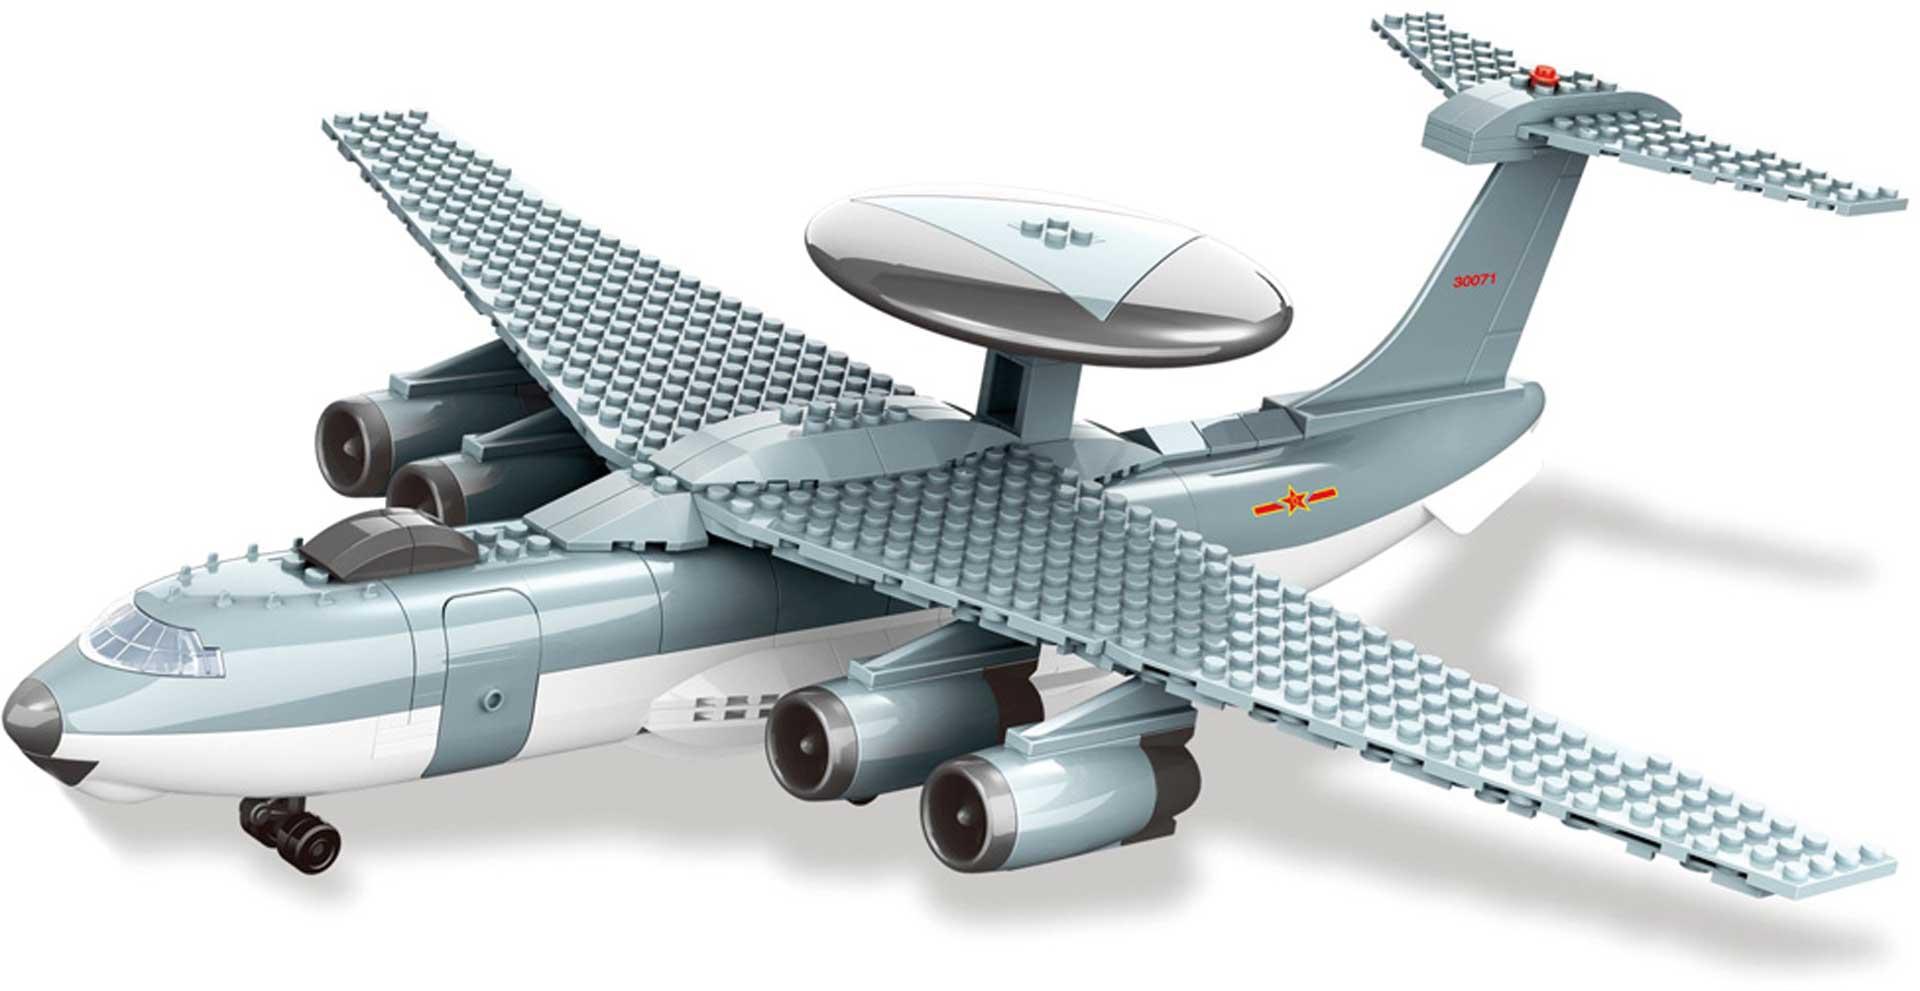 Wange KJ-2000 Frühwarnflugzeug (199 Teile) Klemmbausteine